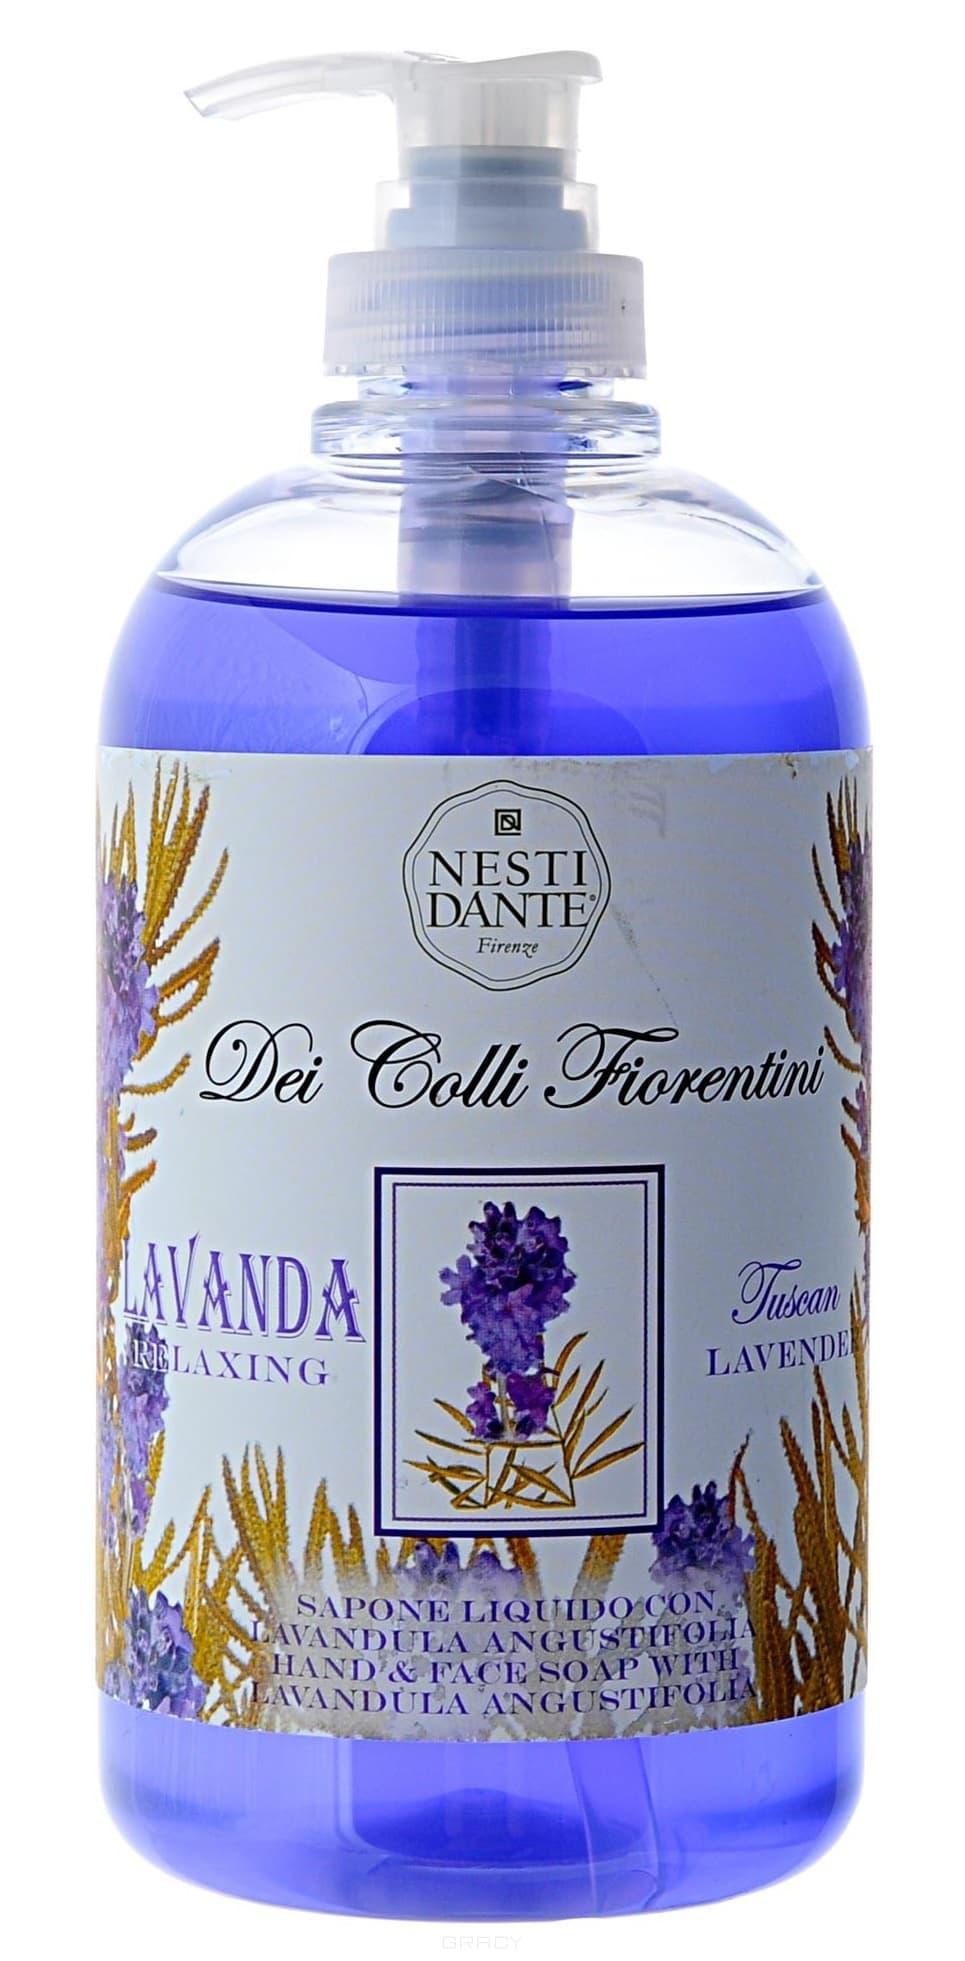 Nesti Dante - Жидкое мыло для рук Тосканская лаванда, 500 мл